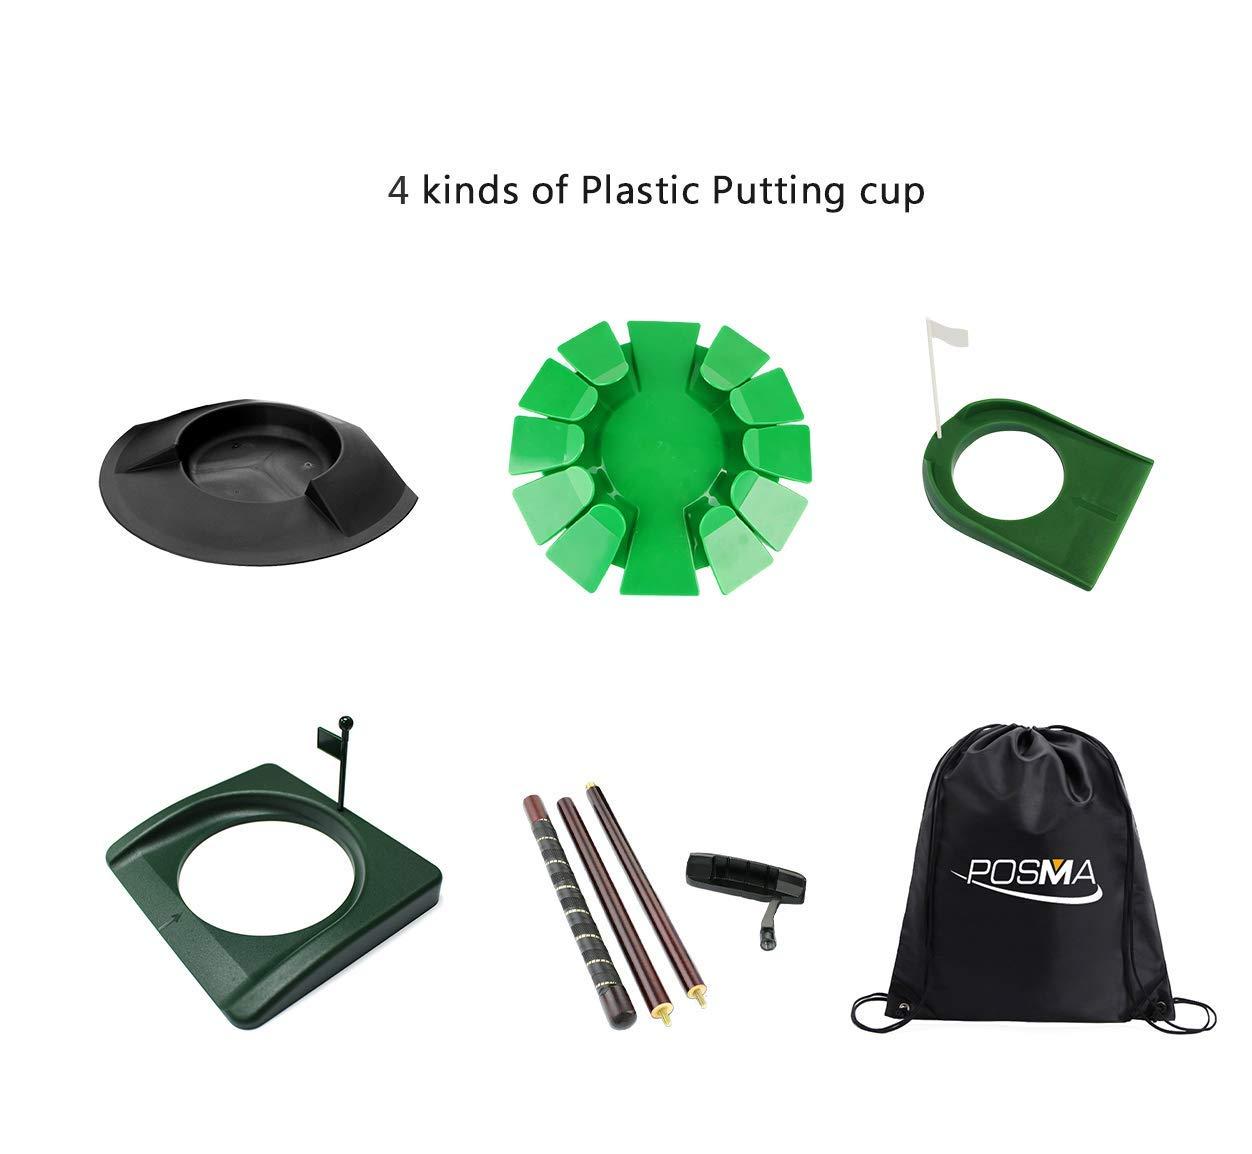 POSMA PHS018 Plastic Practice Putting Cup Golf Hole Training Aid Indoor/Outdoor Bundle Set with 4 Kinds of Plastic Putting Cup+1 Set of Detachable Putter+Black Cinch Sack Bag